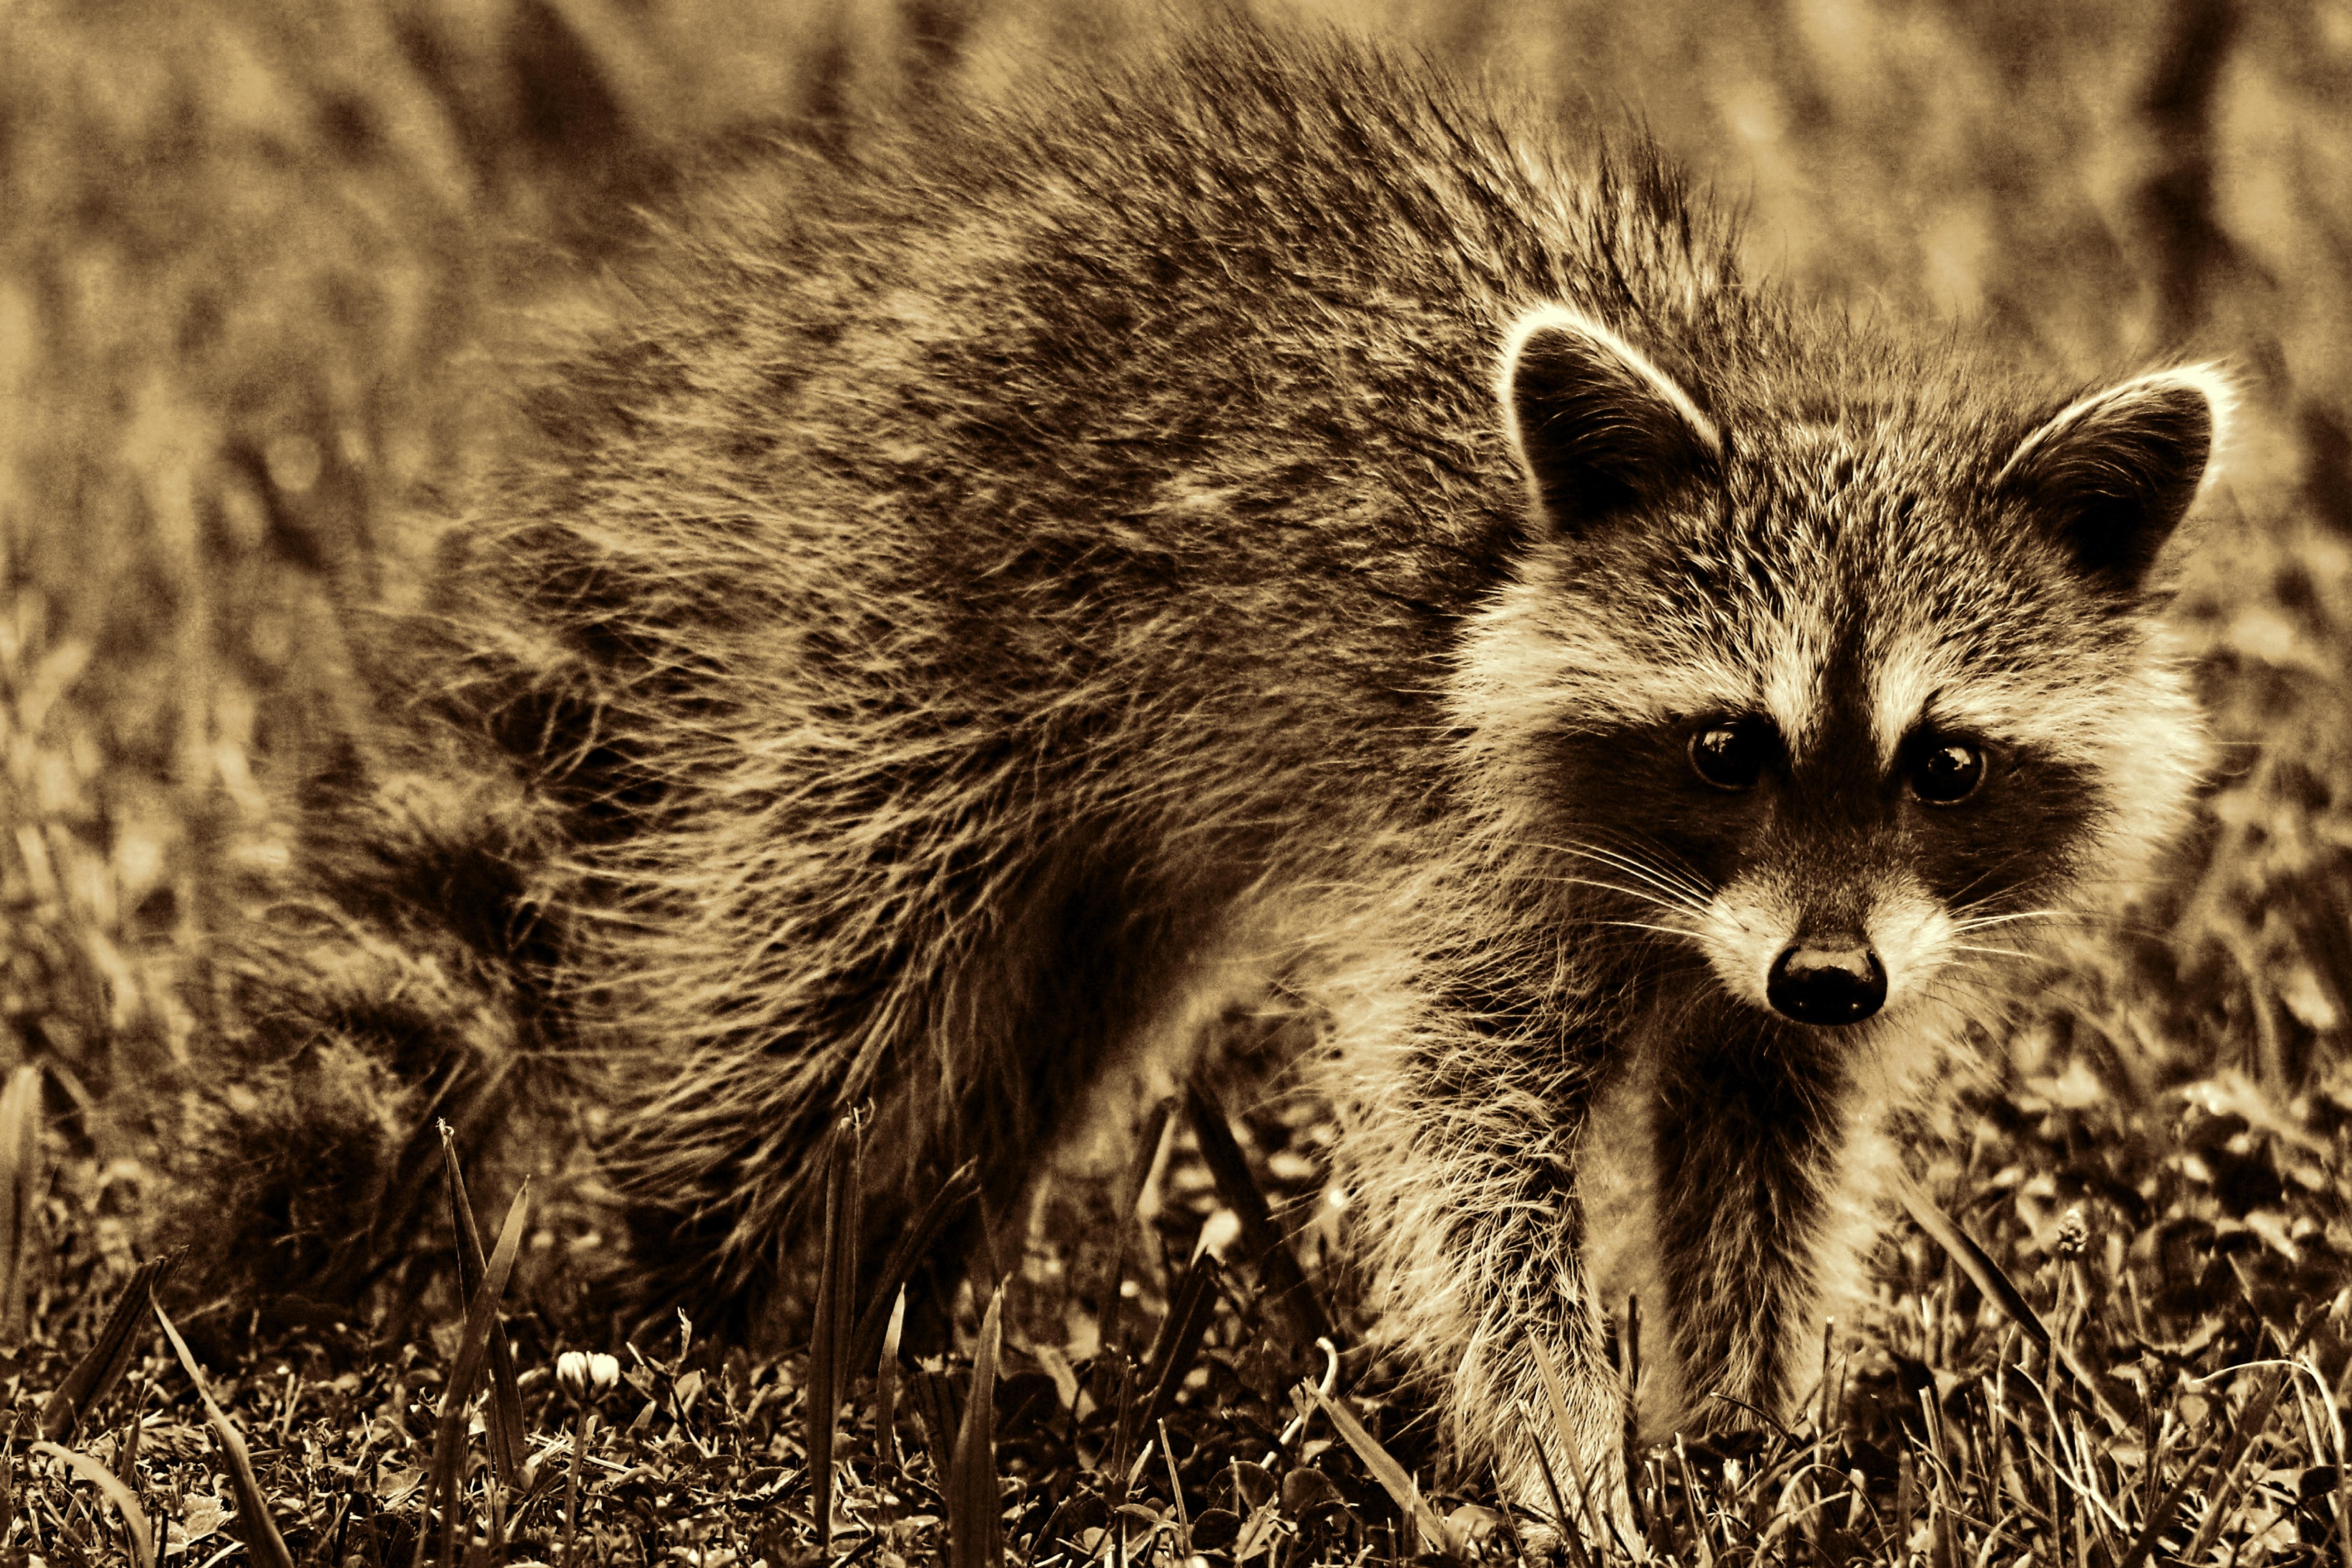 free stock photos of raccoon pexels